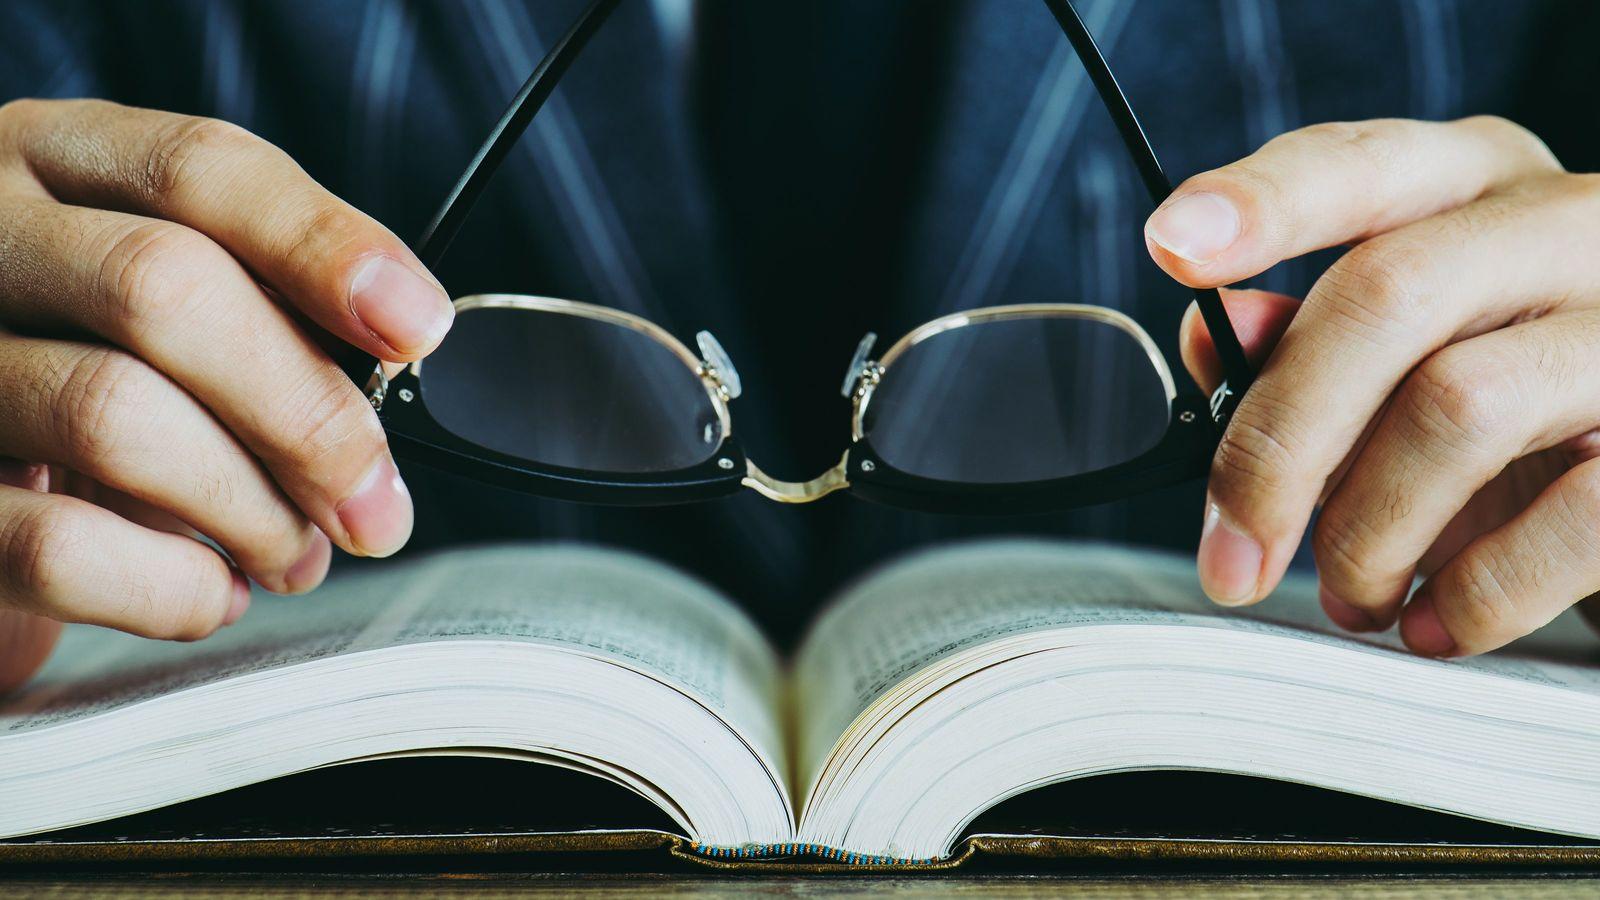 JR東日本社長が「基本に立ち返る時」に読む一冊 何かしら「心に響く言葉」に出合える